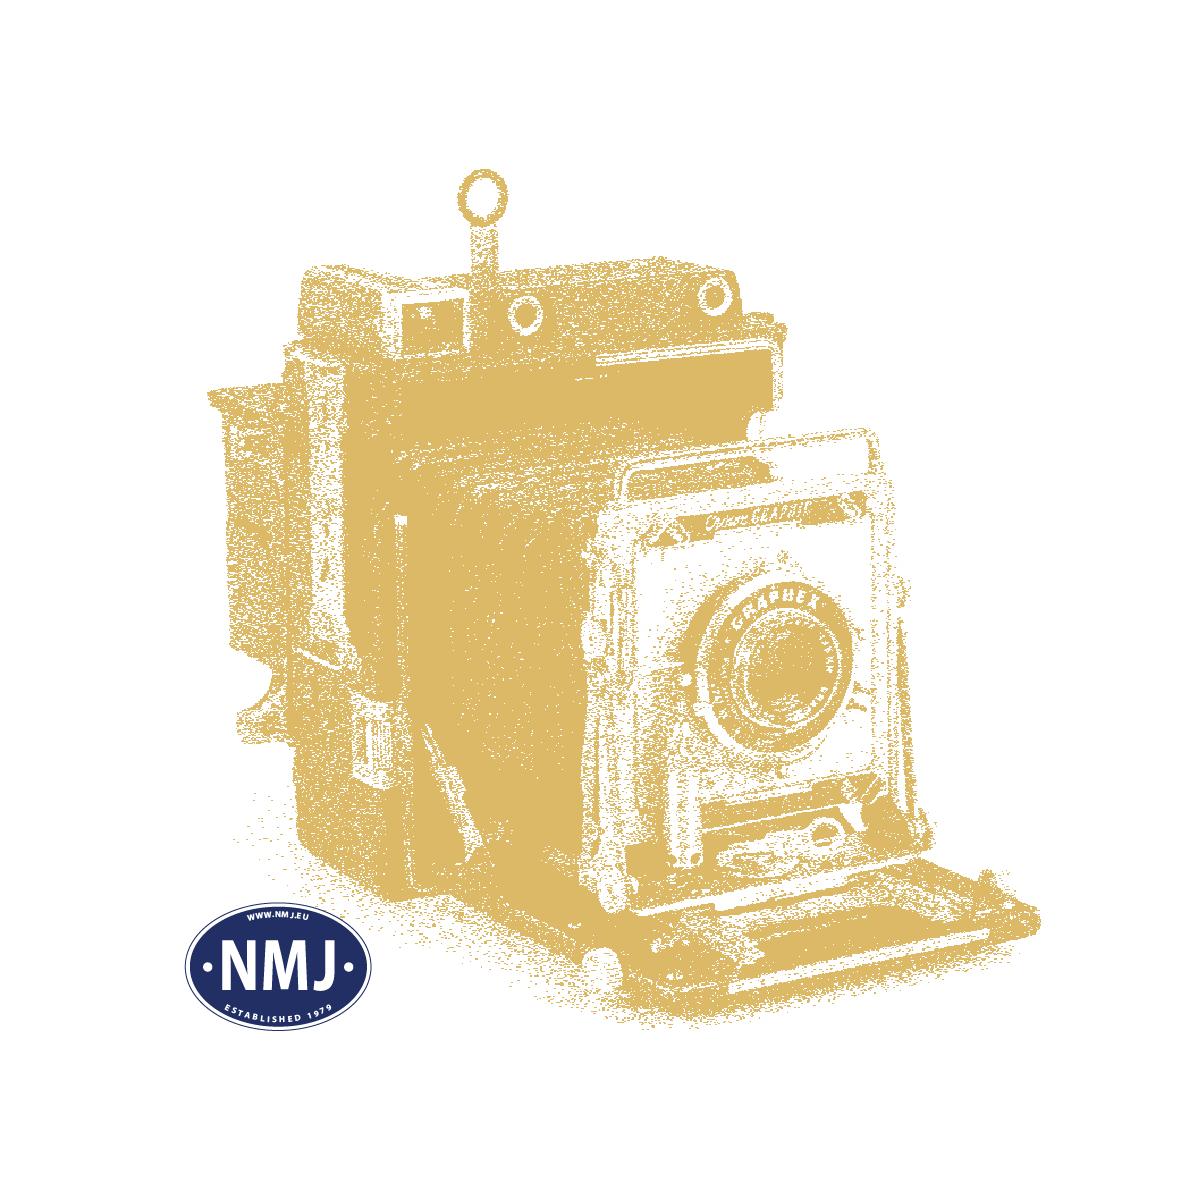 NMJT145002 - NMJ Topline NSB Di3a 622, Gammeldesign, Spur 0